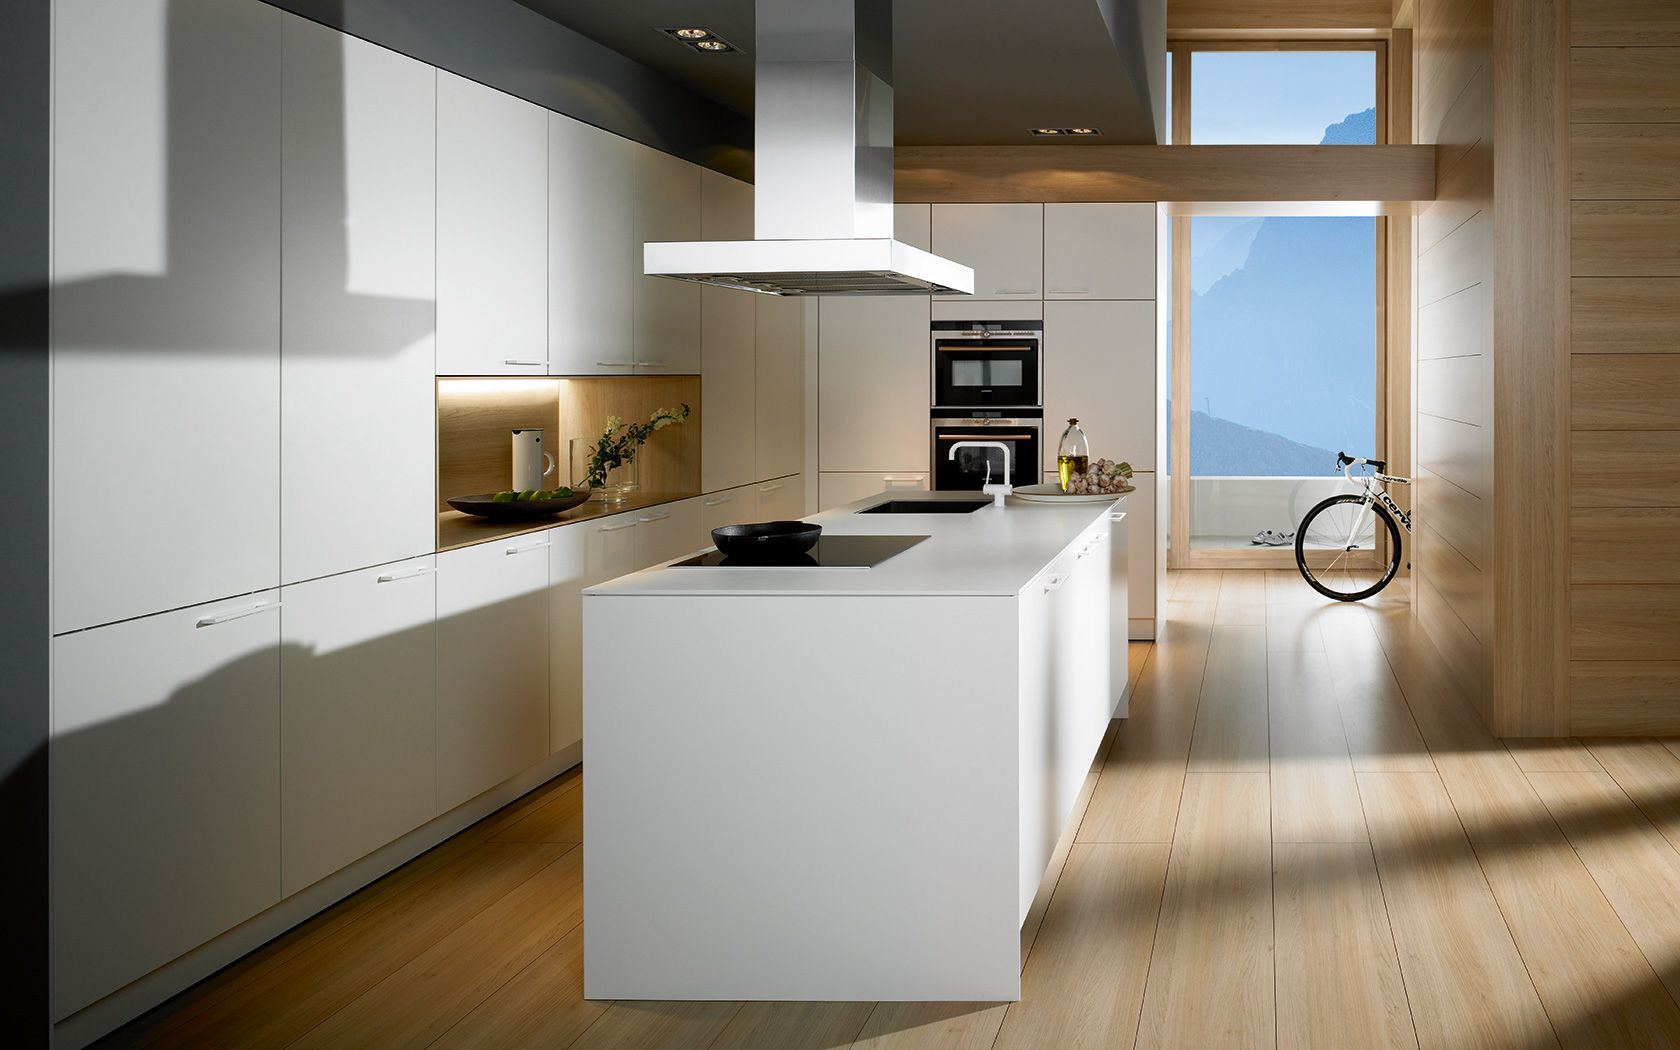 Interieur, cuisine and modern on pinterest